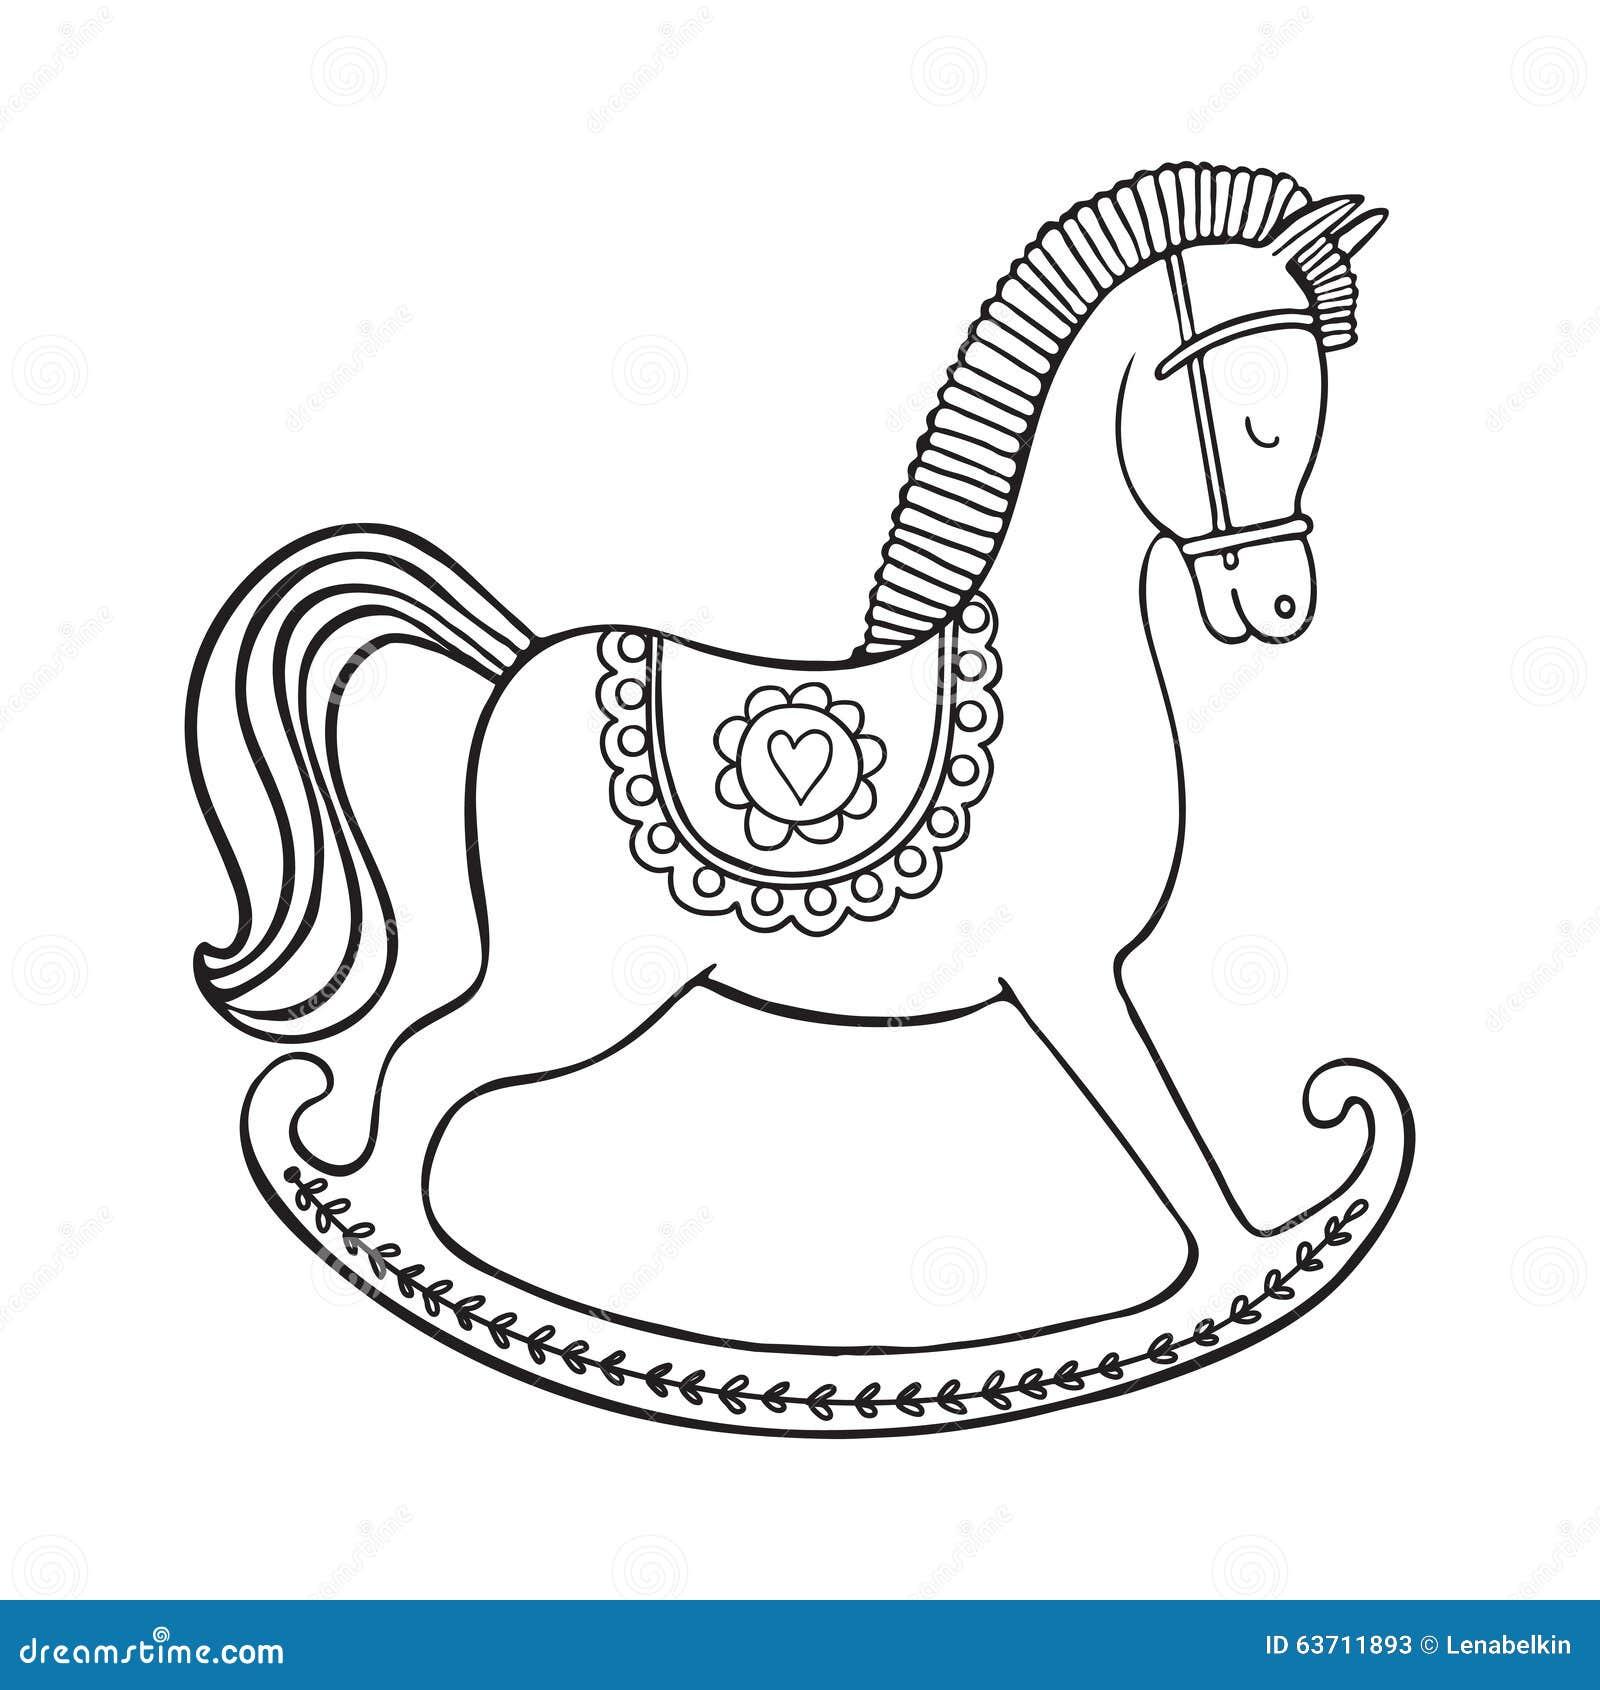 Cavallino A Dondolo Disegno.Rocking Horse On White Background Stock Vector Illustration Of